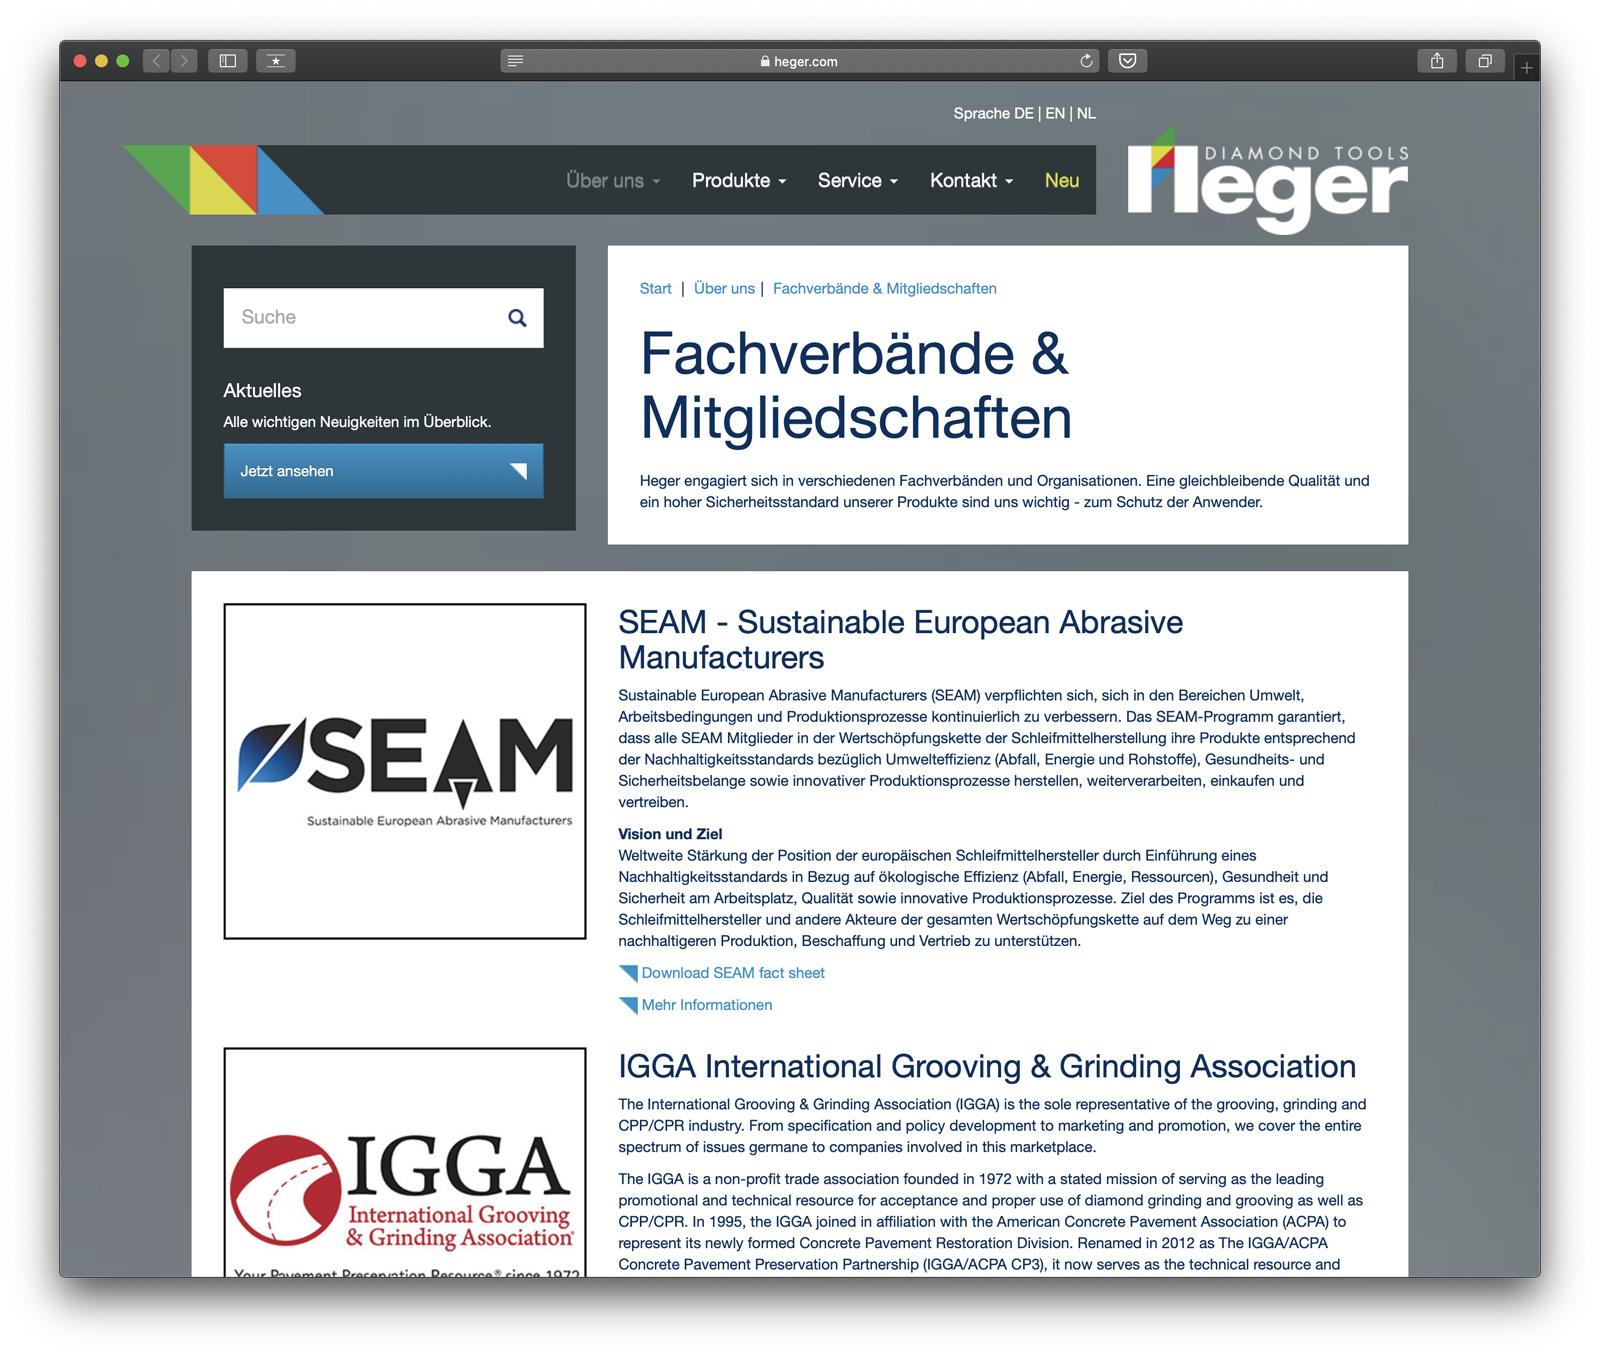 SEAM – Sustainable European Abrasive Manufacturers